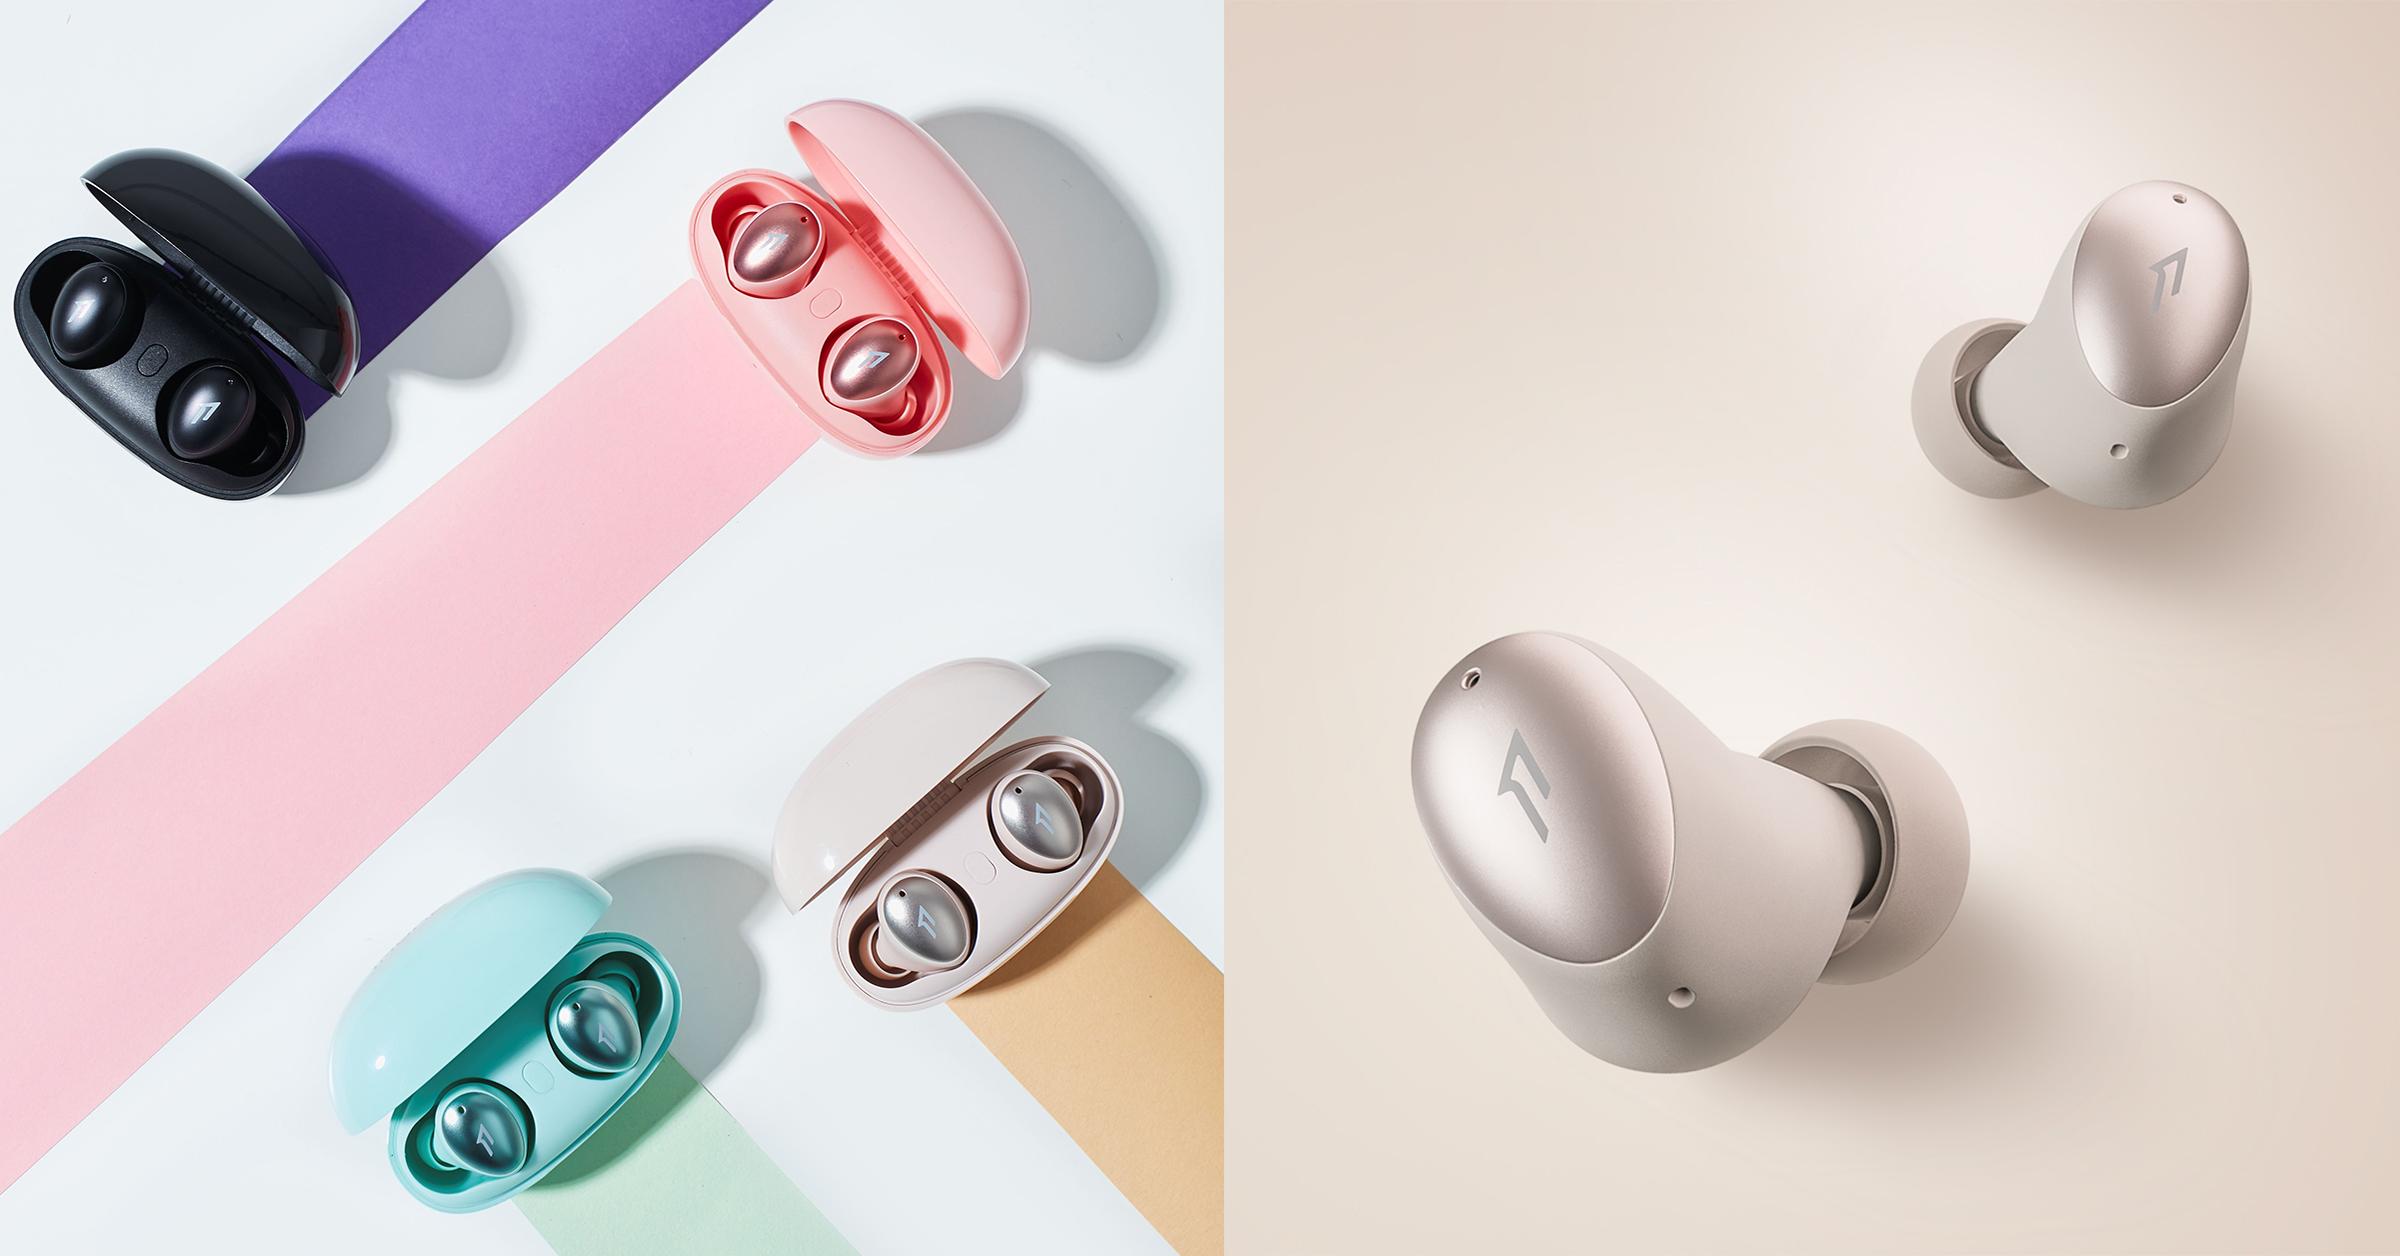 1MORE ColorBuds時尚豆真無線耳機,比一張A4還輕巧、續航力可達22小時!